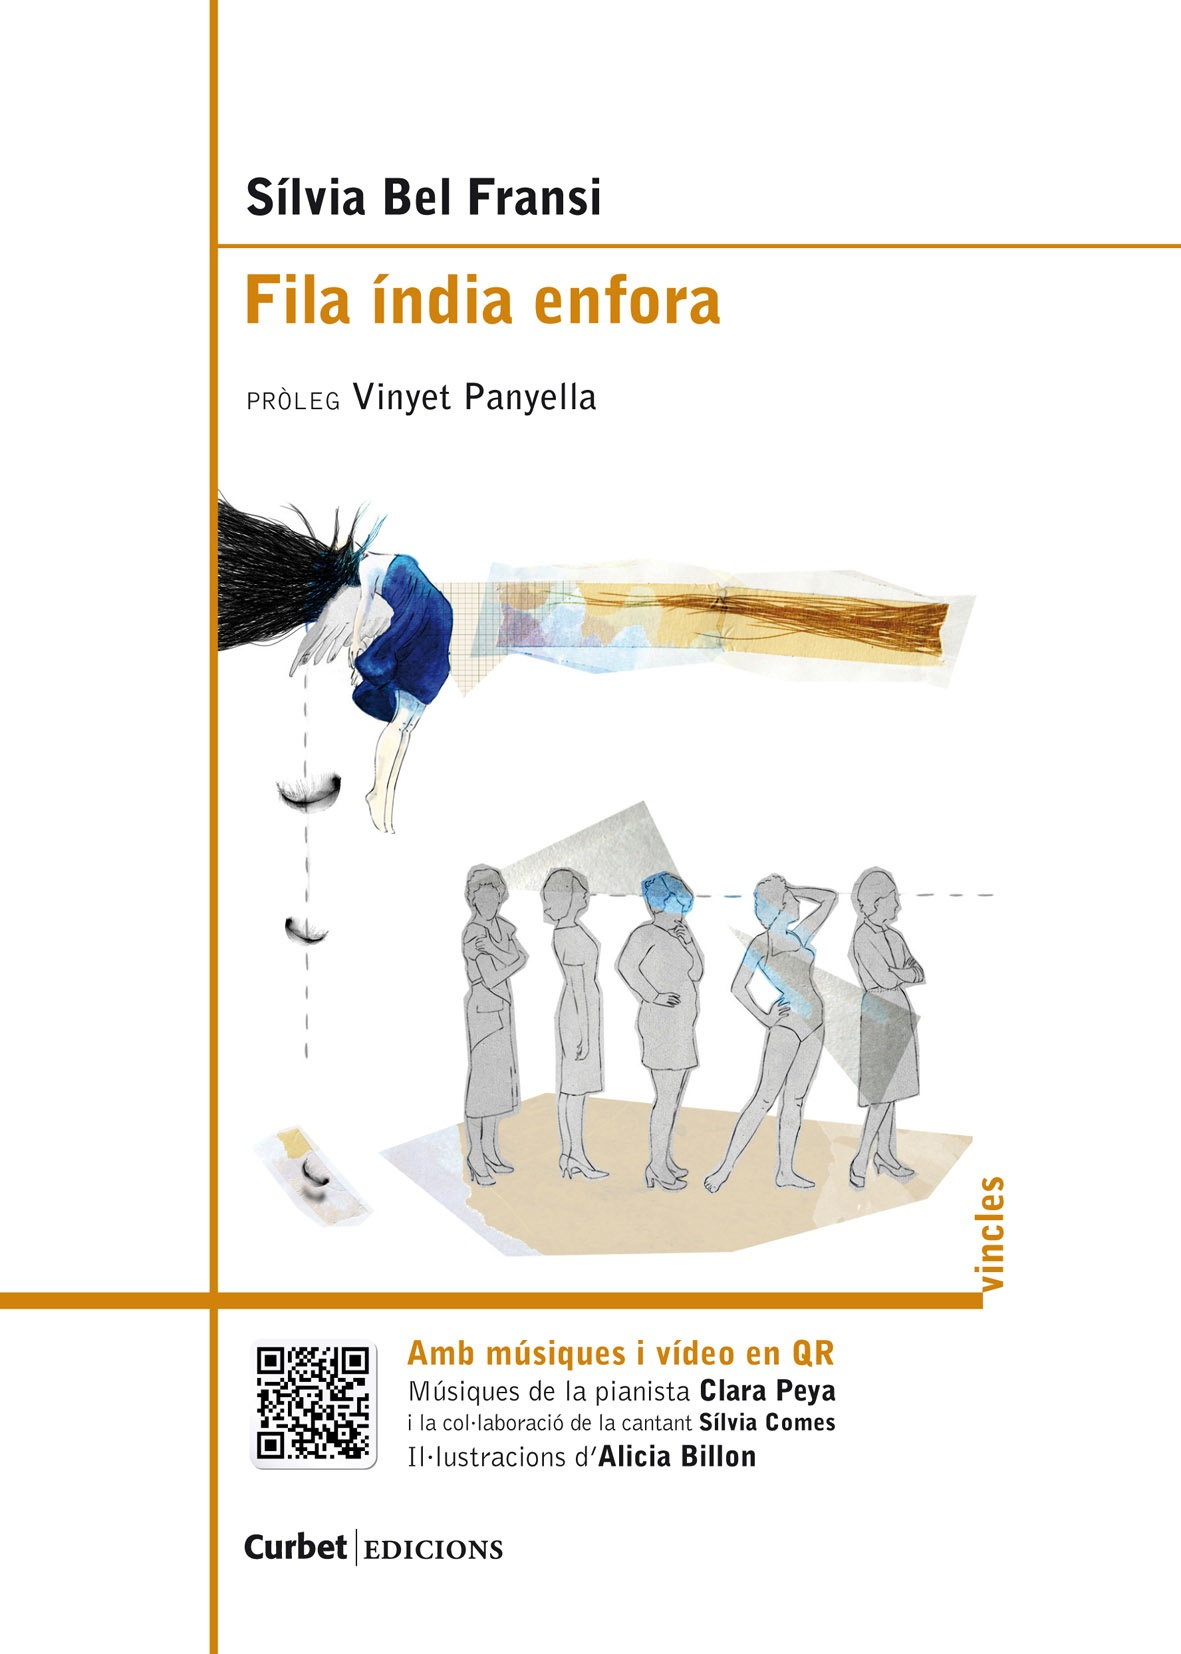 Festa presentació Fila índia enfora